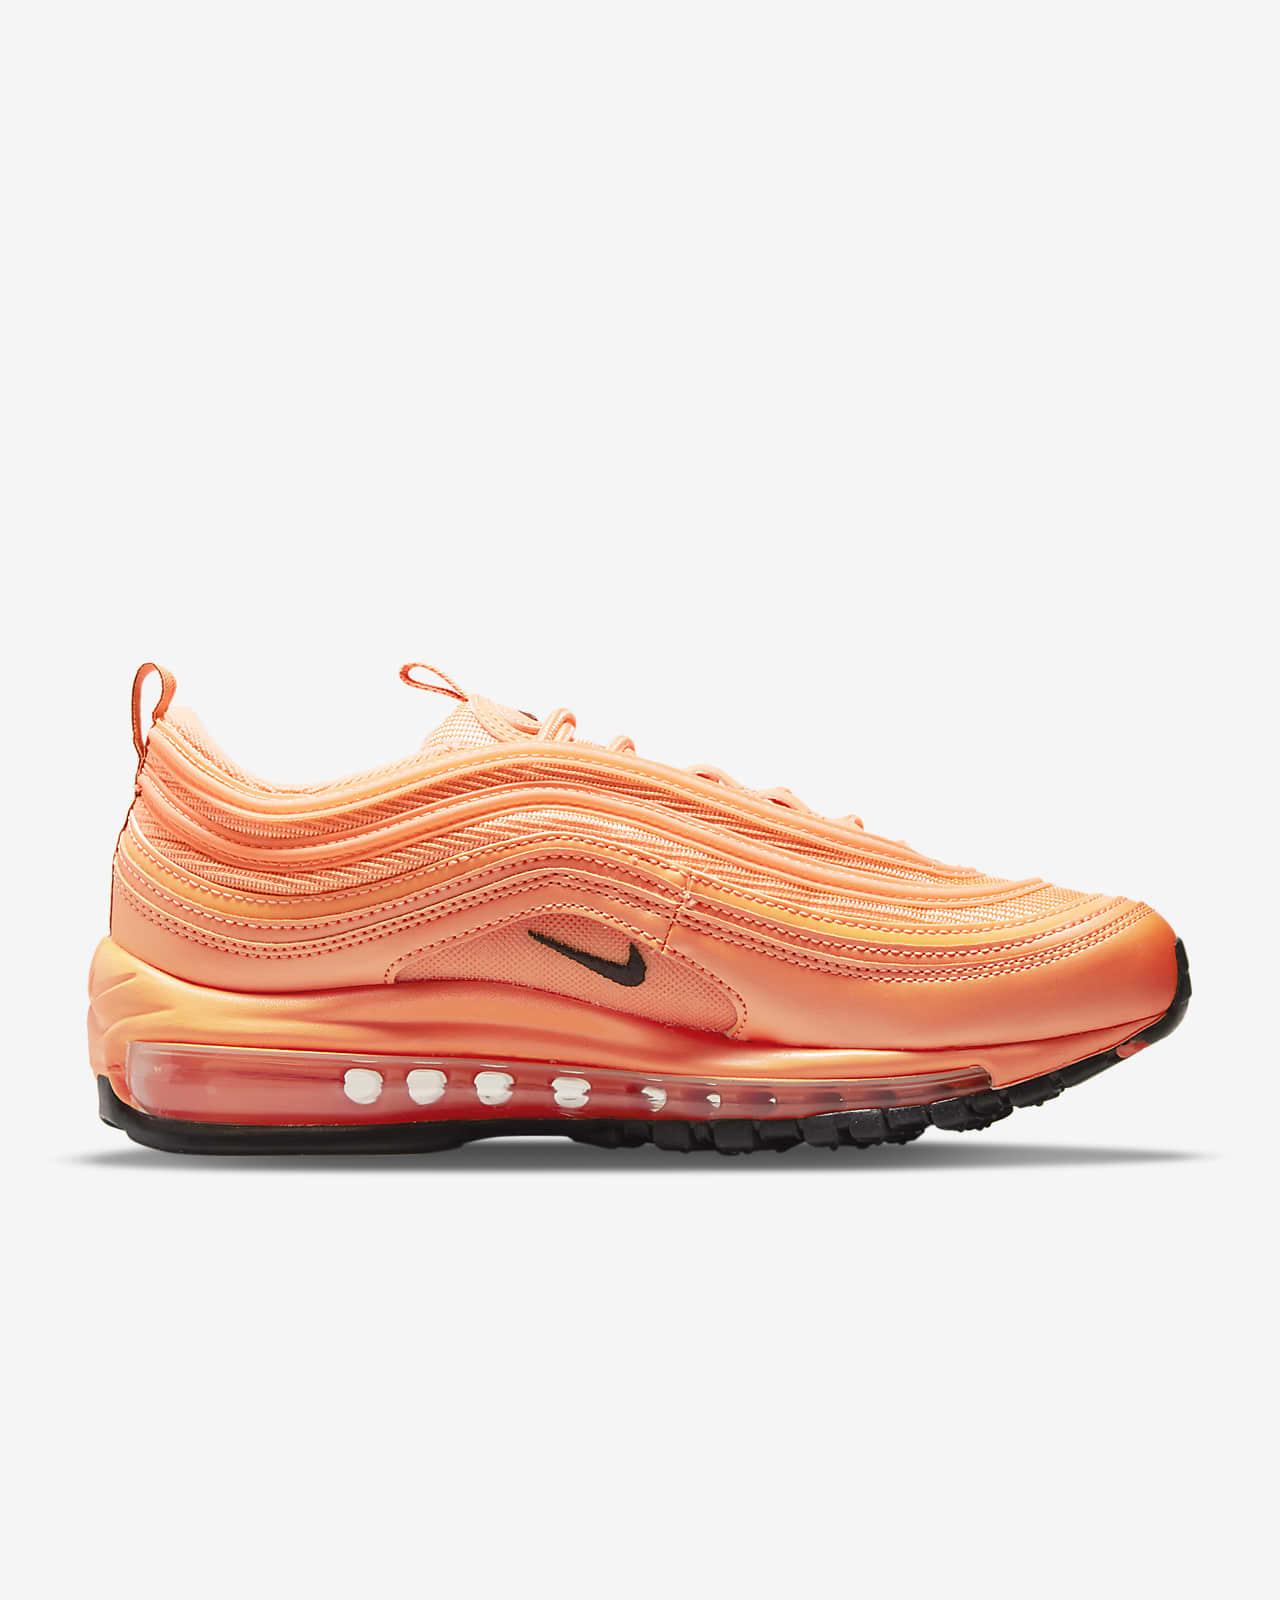 Nike Air Max 97 Women's Shoes